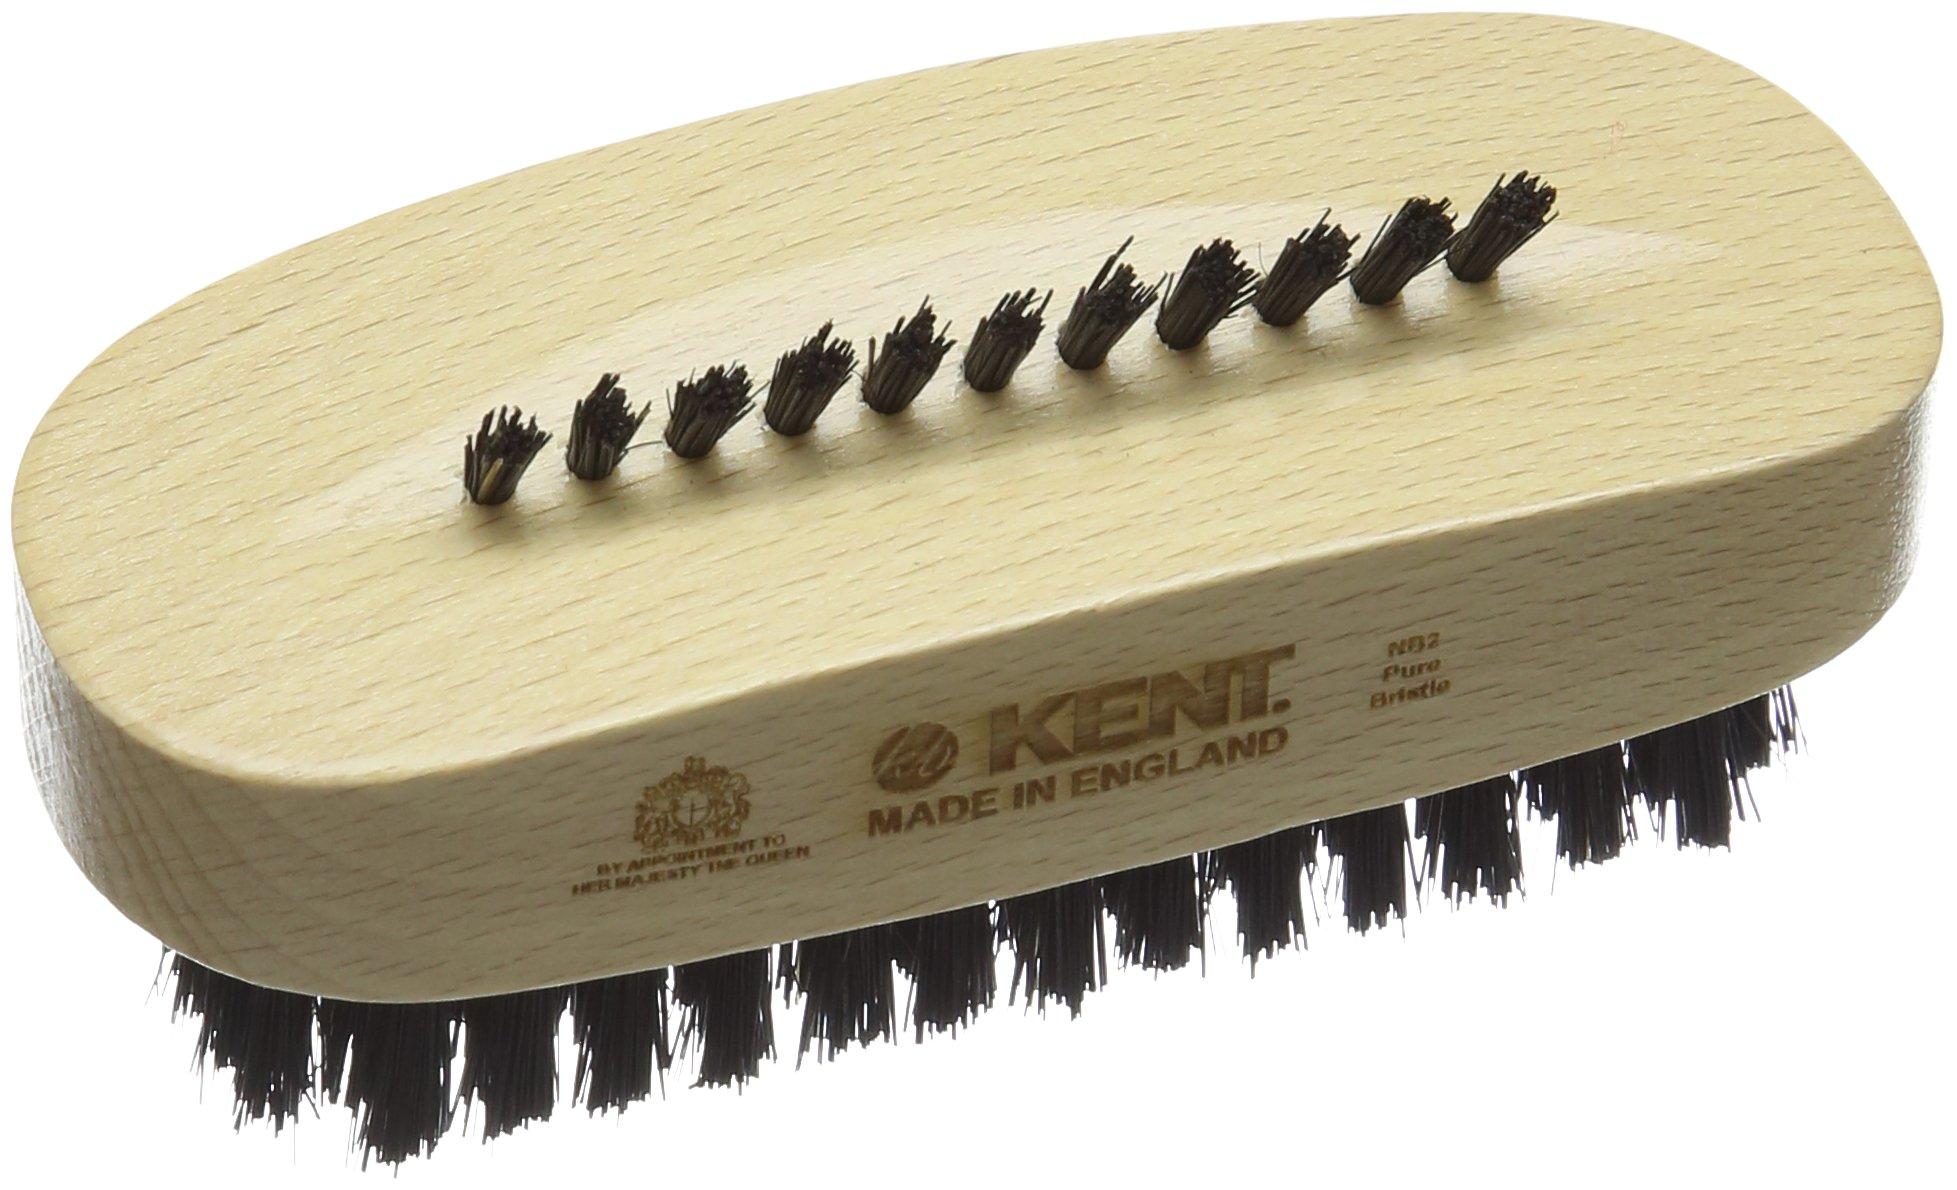 Kent NB2 Beech Wood Nail Brush